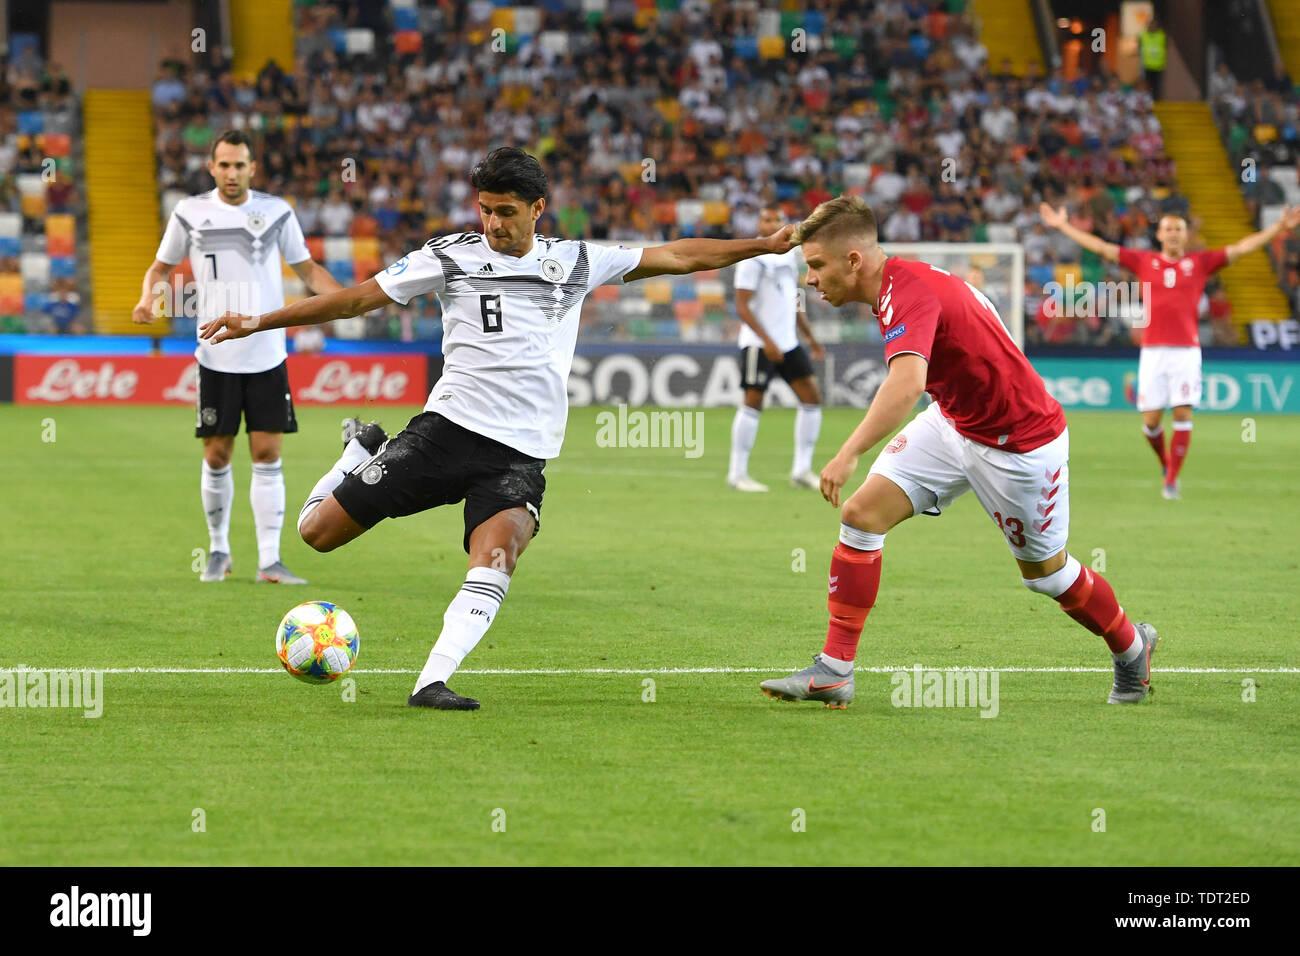 Udine, Italien. 17th June, 2019. goalchance Mahmoud DAHOUD (GER), Shot, Action, duels versus Mads PEDERSEN (DEN). Germany (GER) -Daenemark (DEN) 3-1, on 17.06.2019 Stadio Friuli Udine. Football U-21, UEFA Under21 European Championship in Italy/SanMarino from 16.-30.06.2019. | Usage worldwide Credit: dpa/Alamy Live News - Stock Image